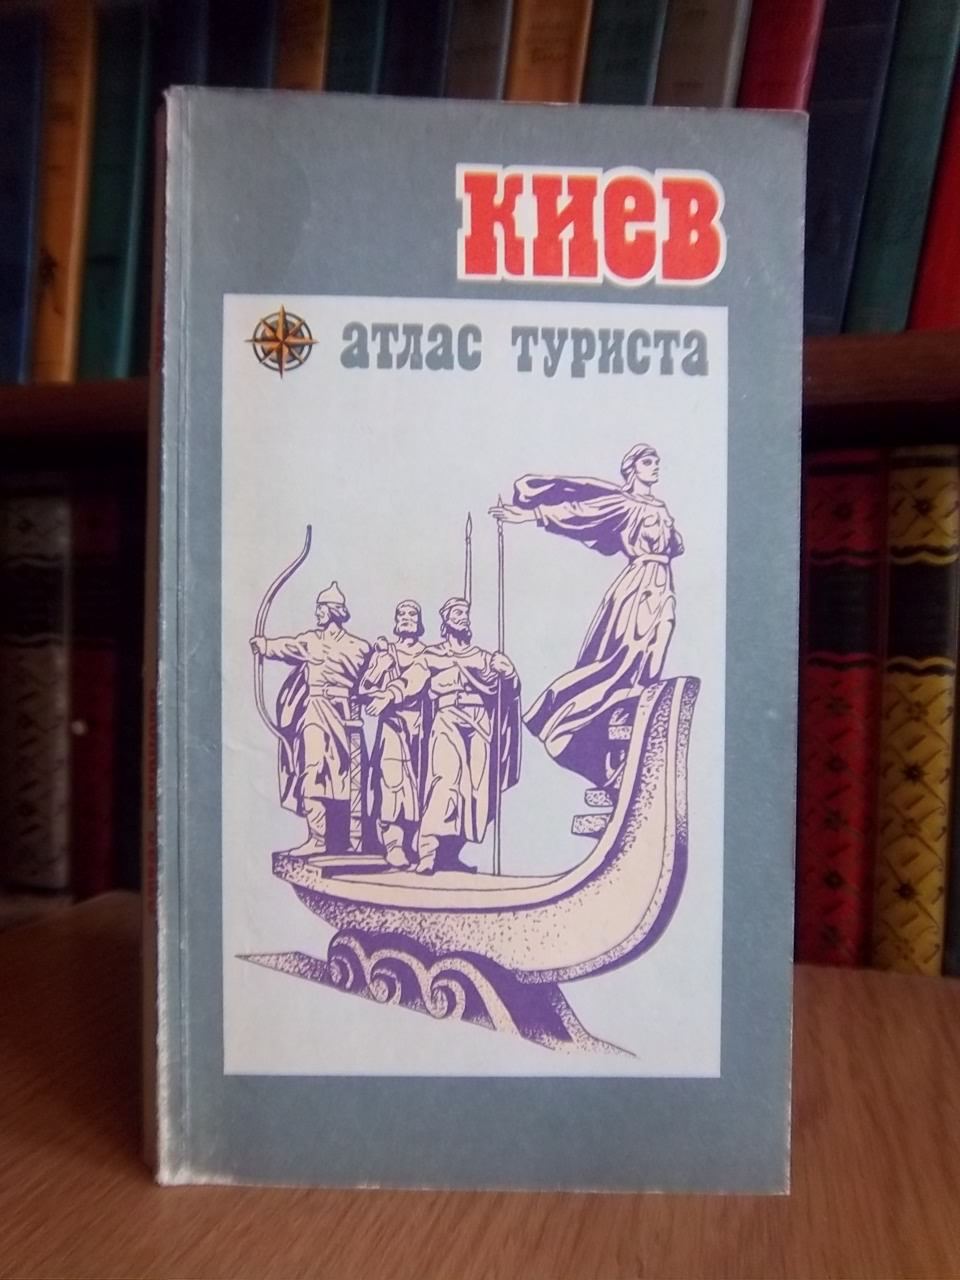 Киев Атлас туриста